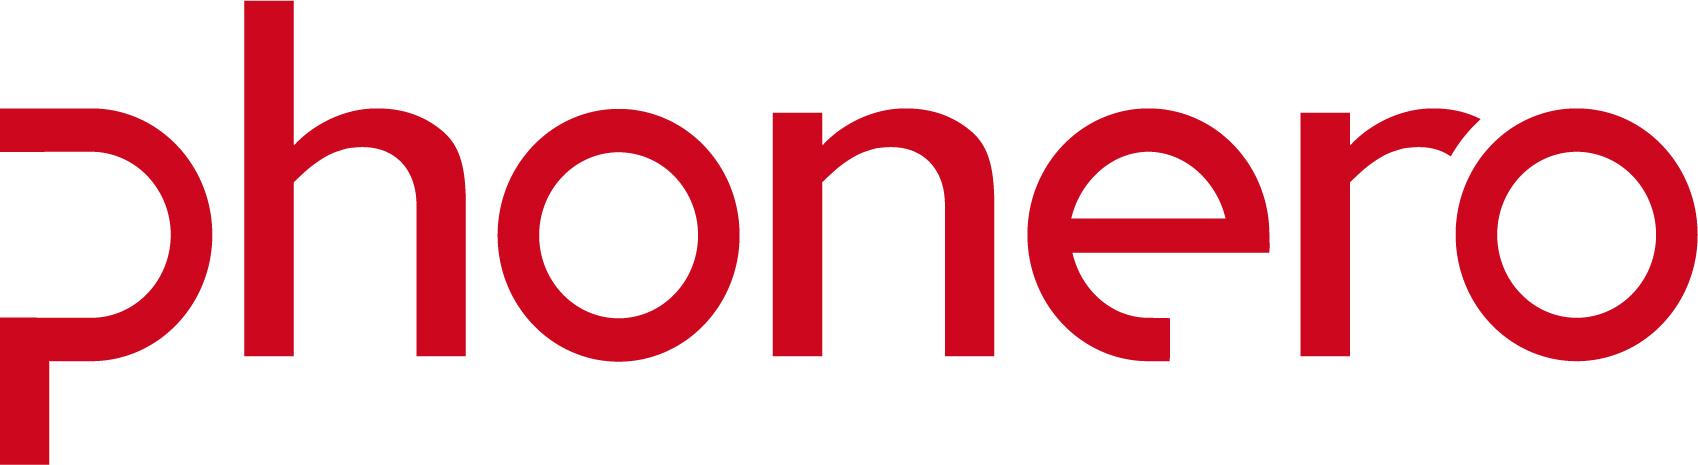 Phonero_logo_RGB